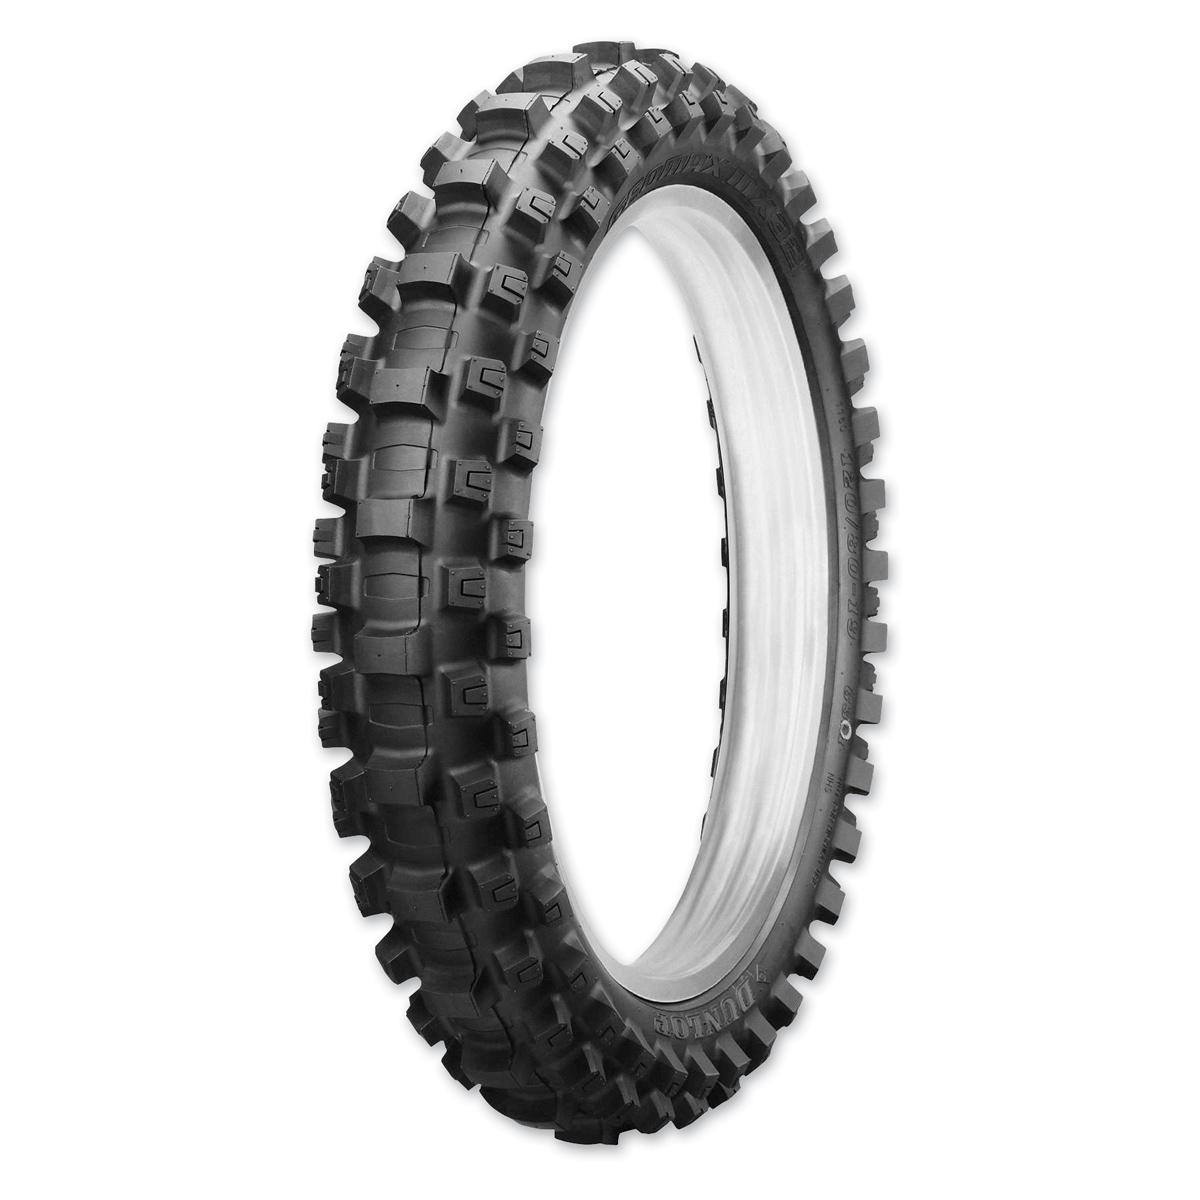 Dunlop MX3S/32 80/100-12 S/T-I/T Rear Tire